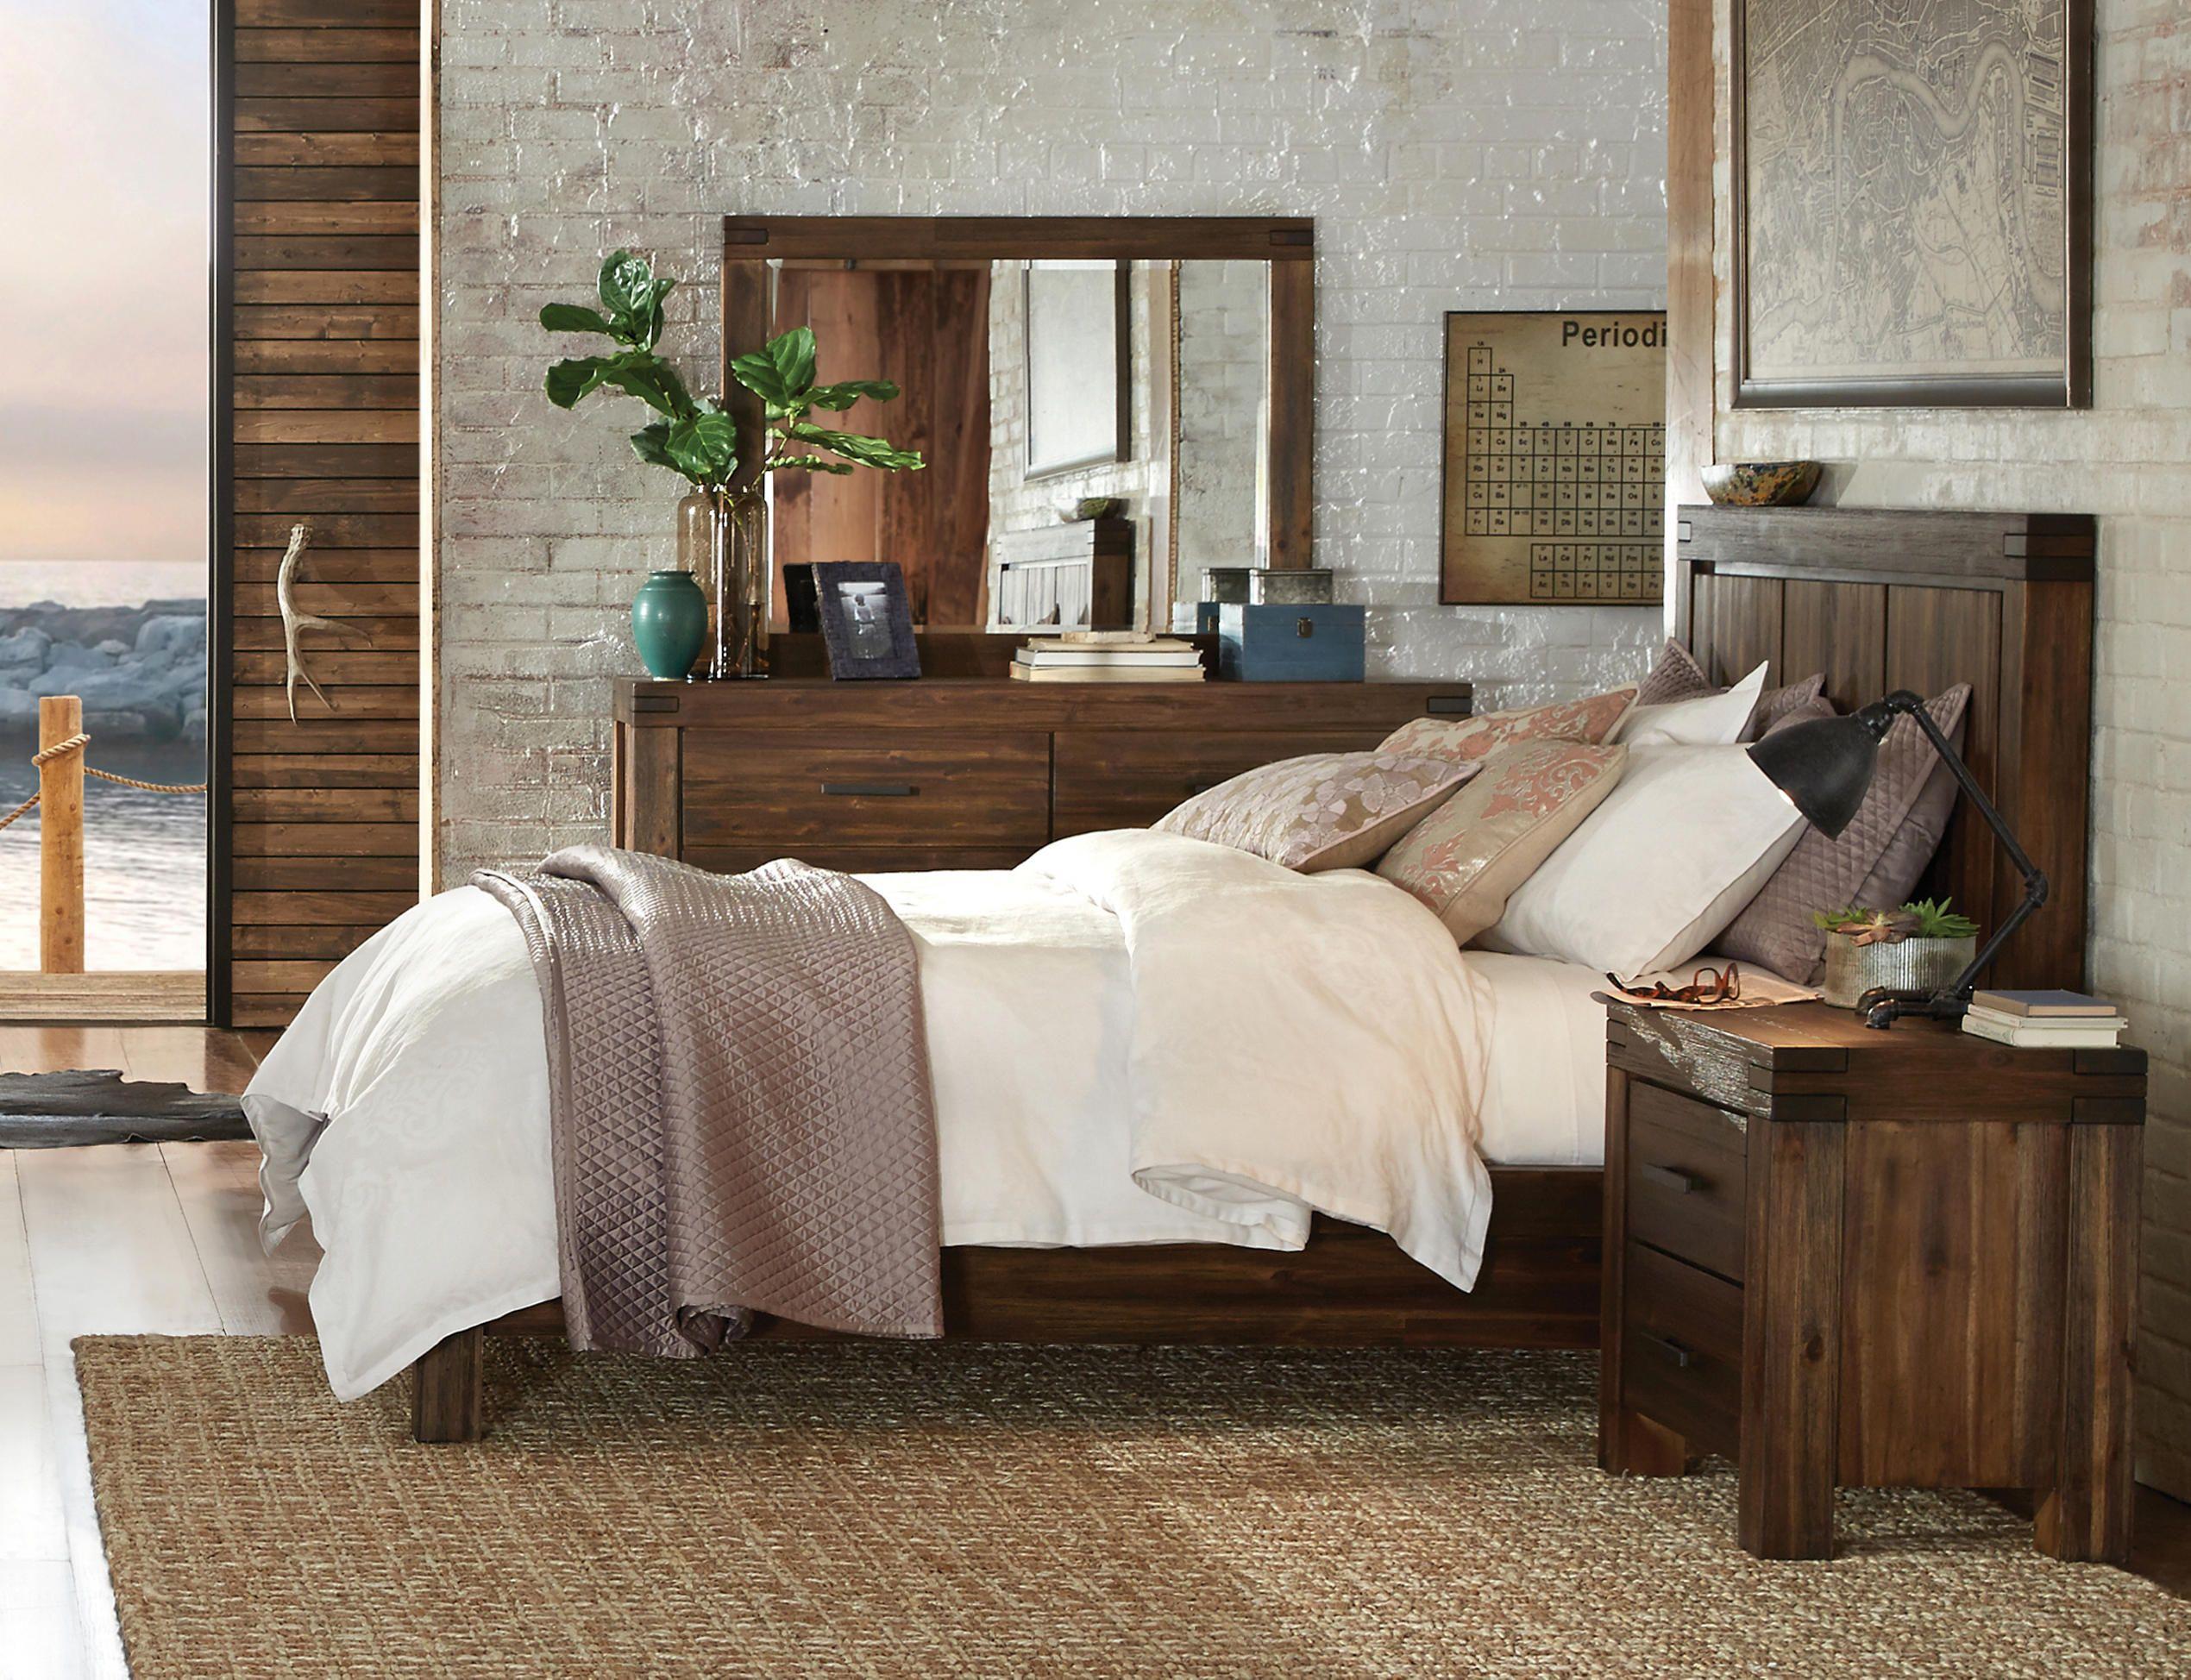 Meadowbrook Collection Bedroom furniture sets, Bedroom